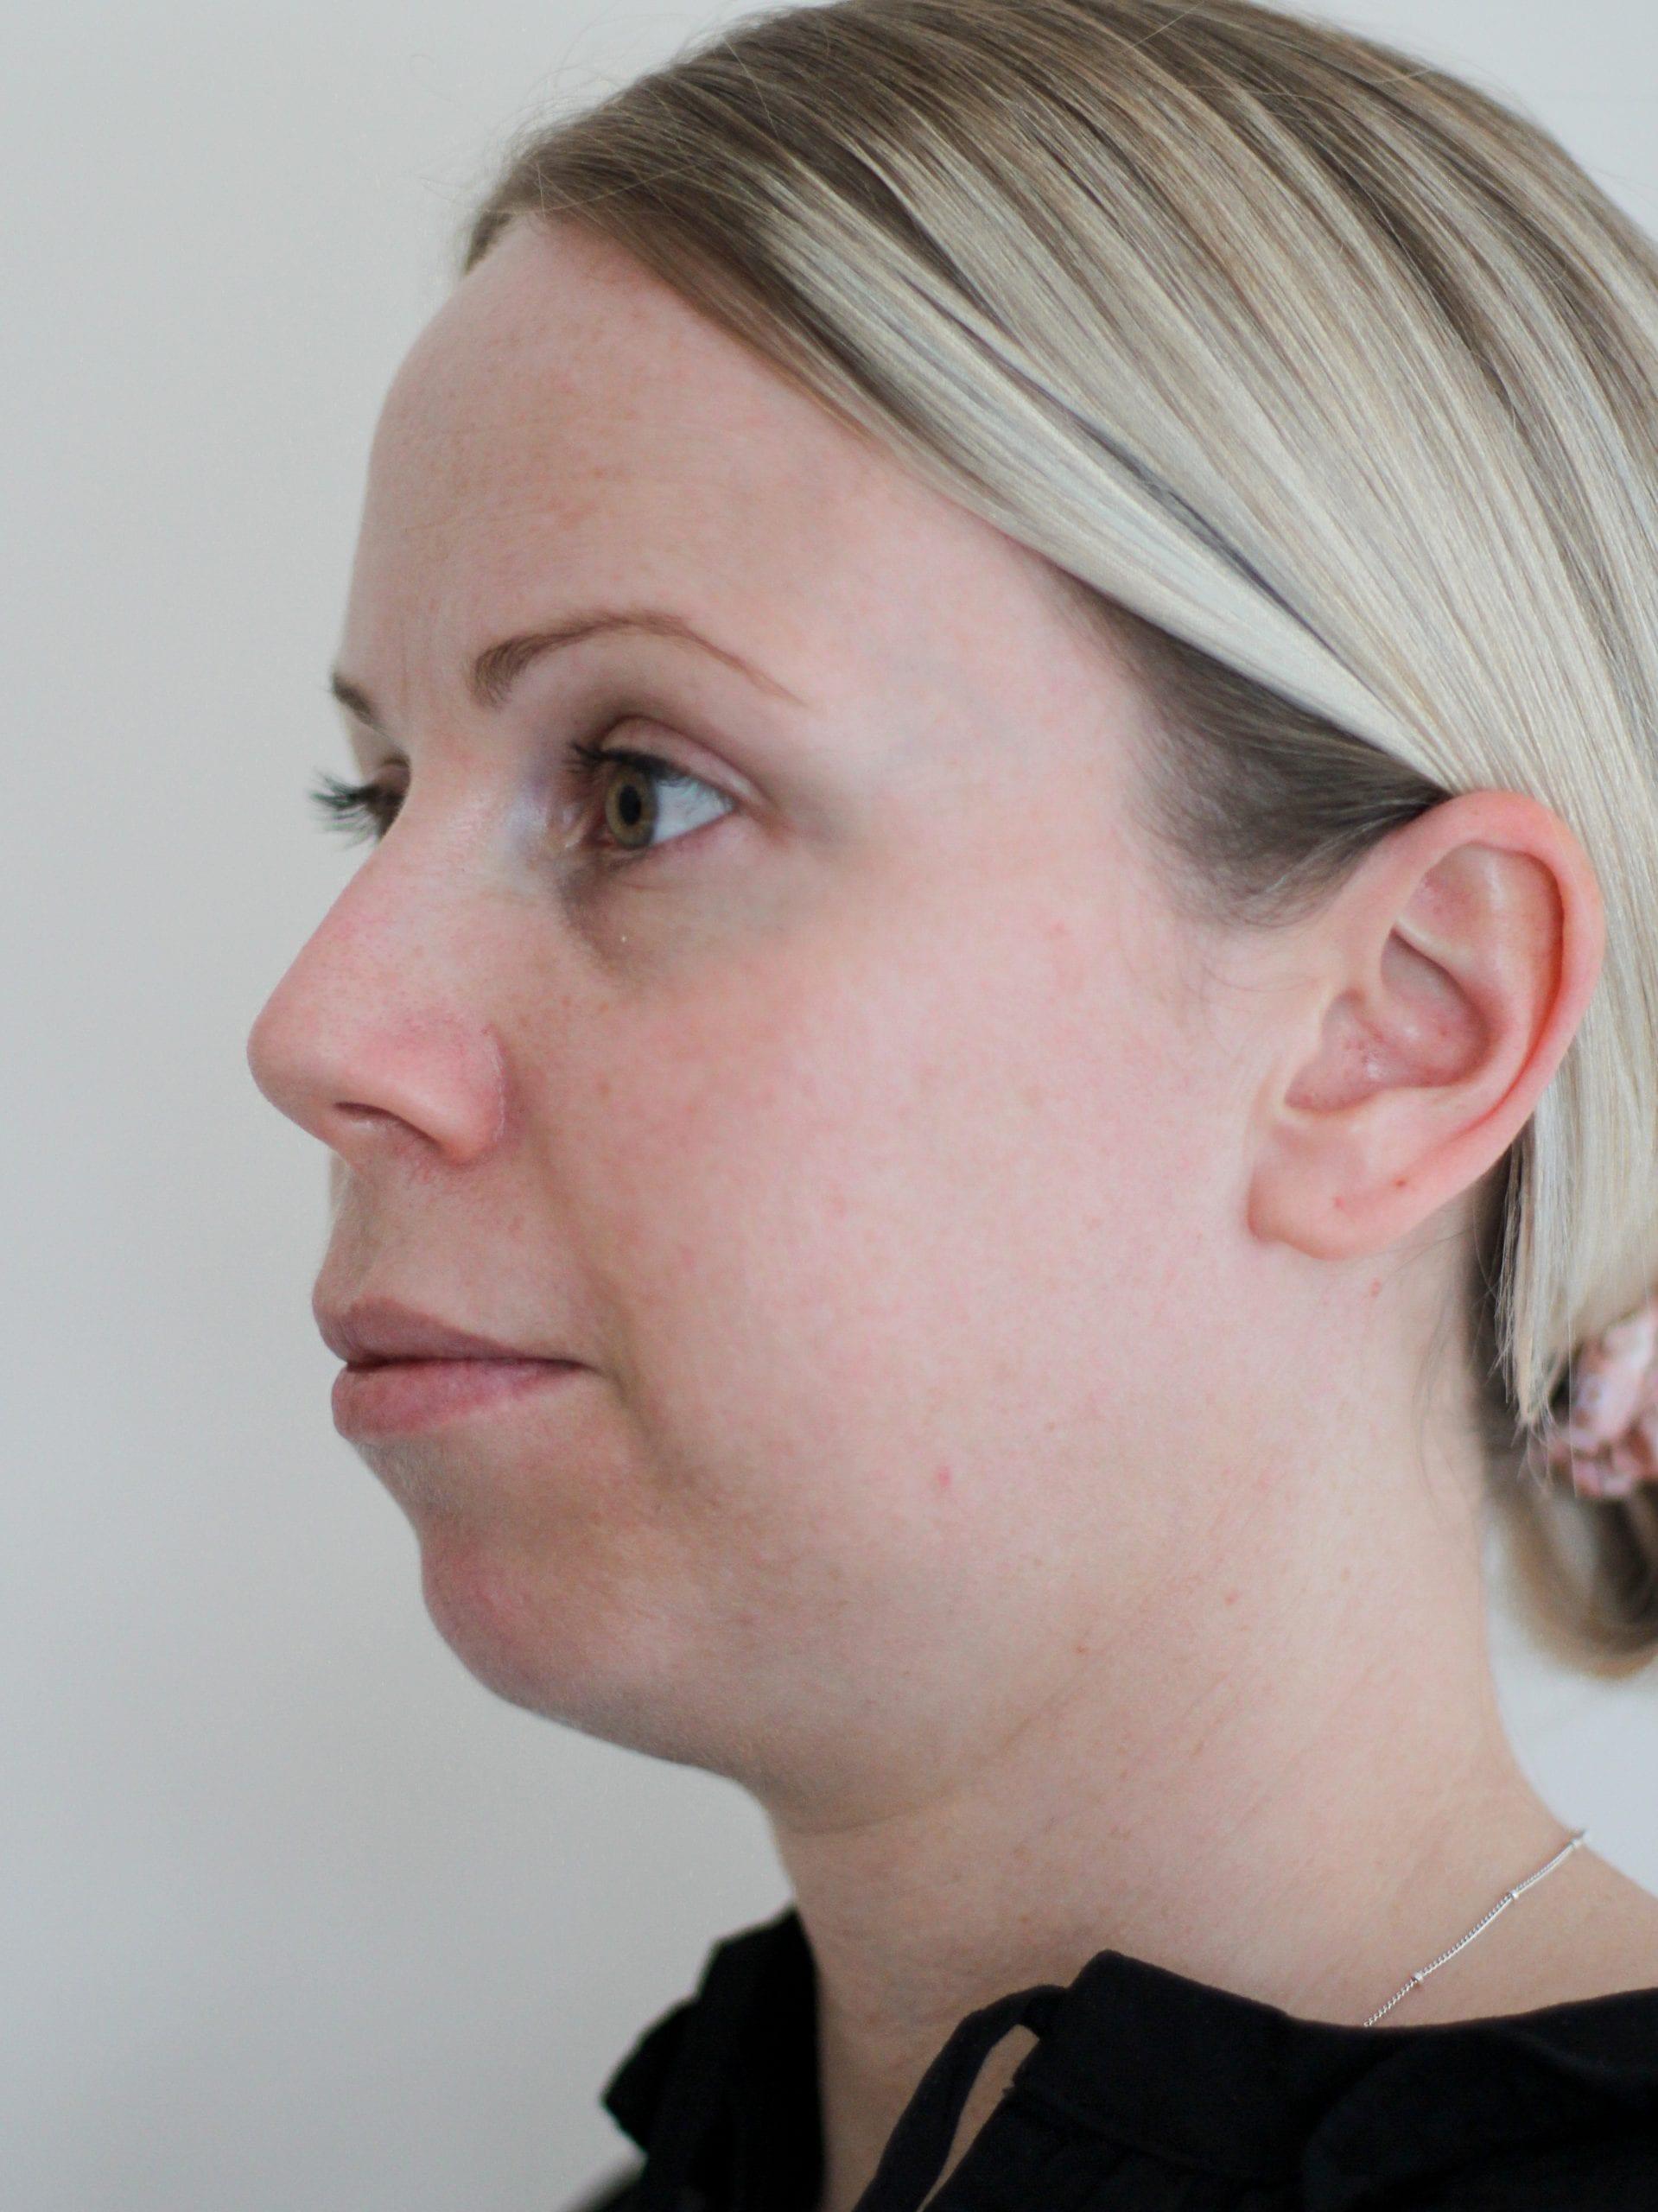 chin augmentation treatment before